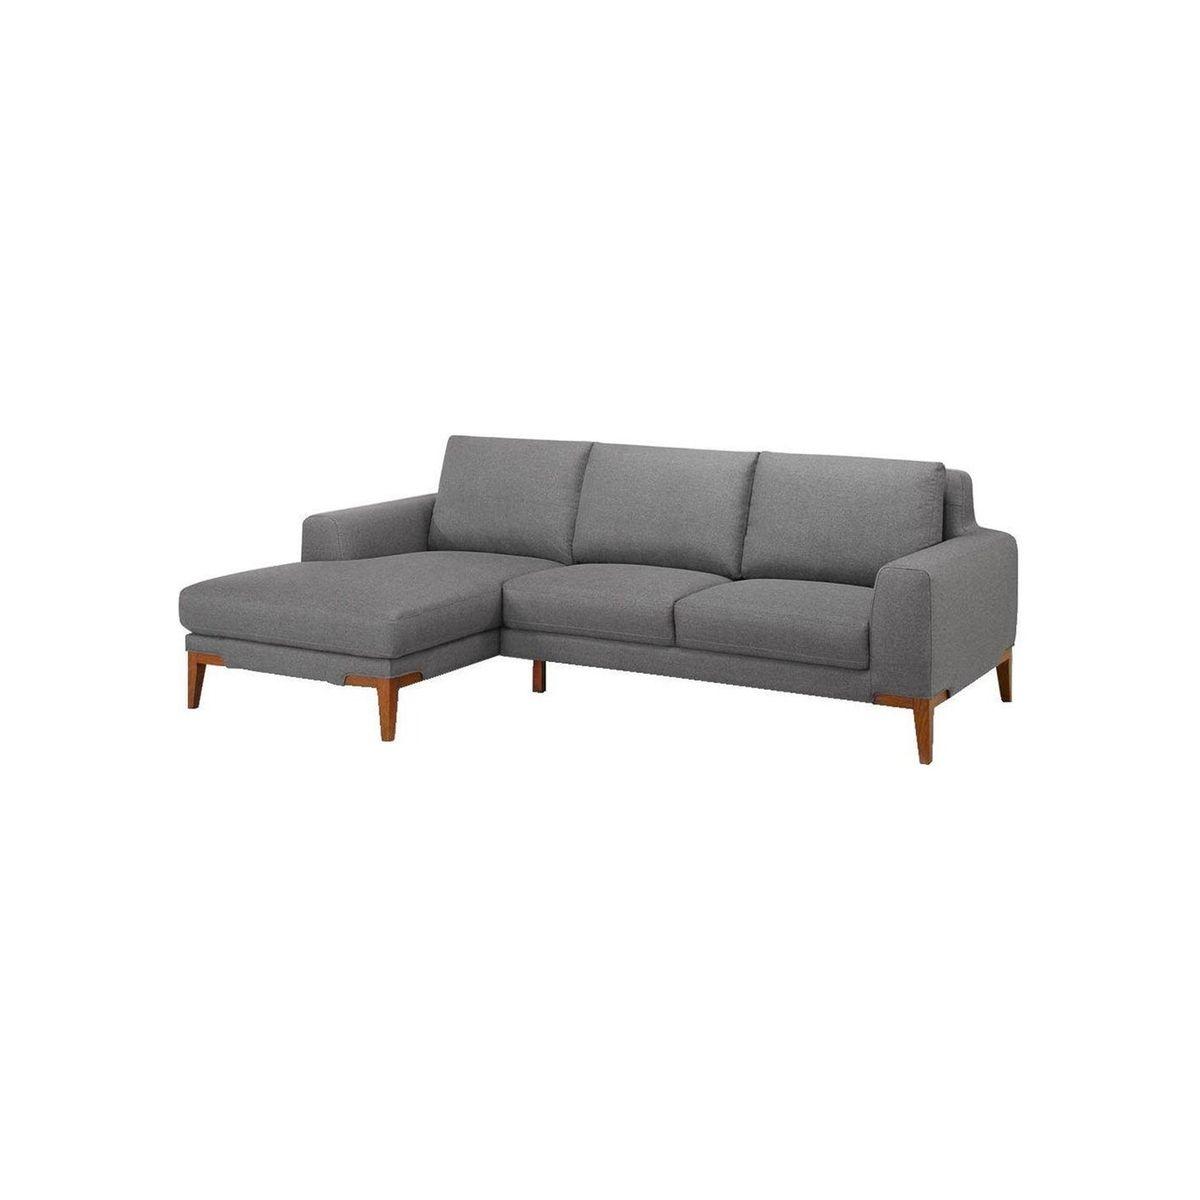 Canapé d'angle gauche SUN SEASON tissu